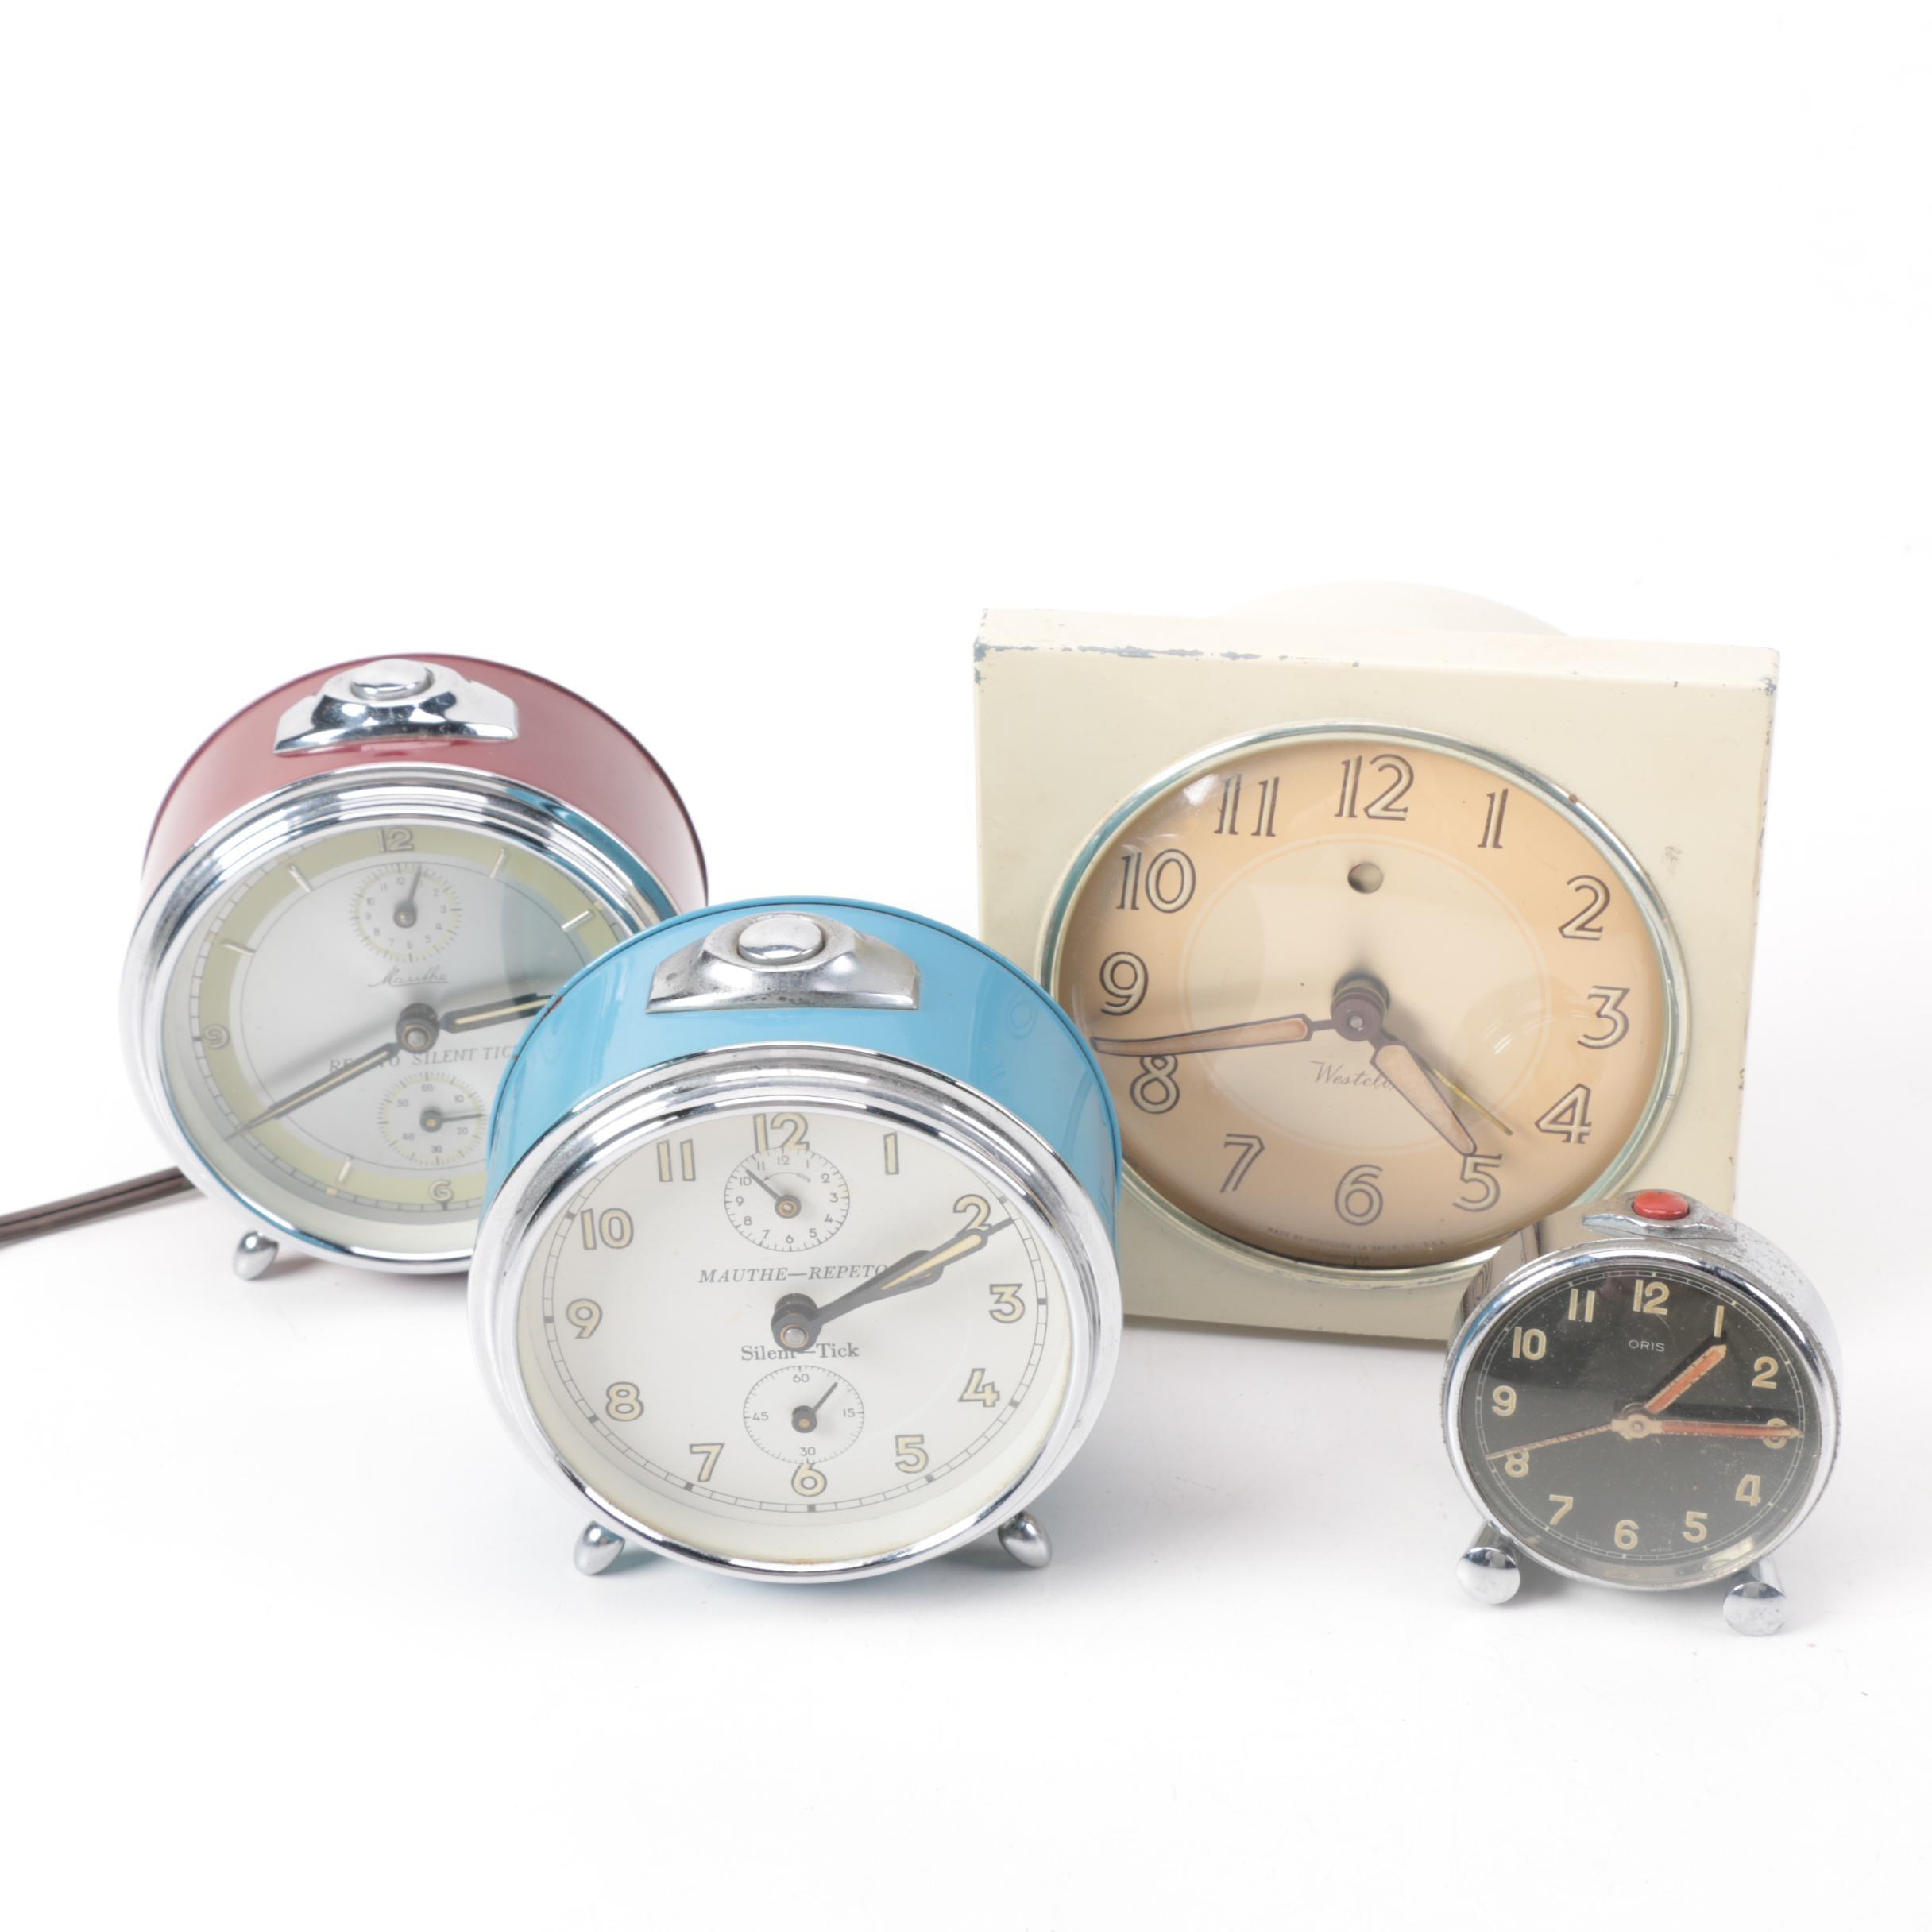 Retro Style Vintage Alarm Clocks